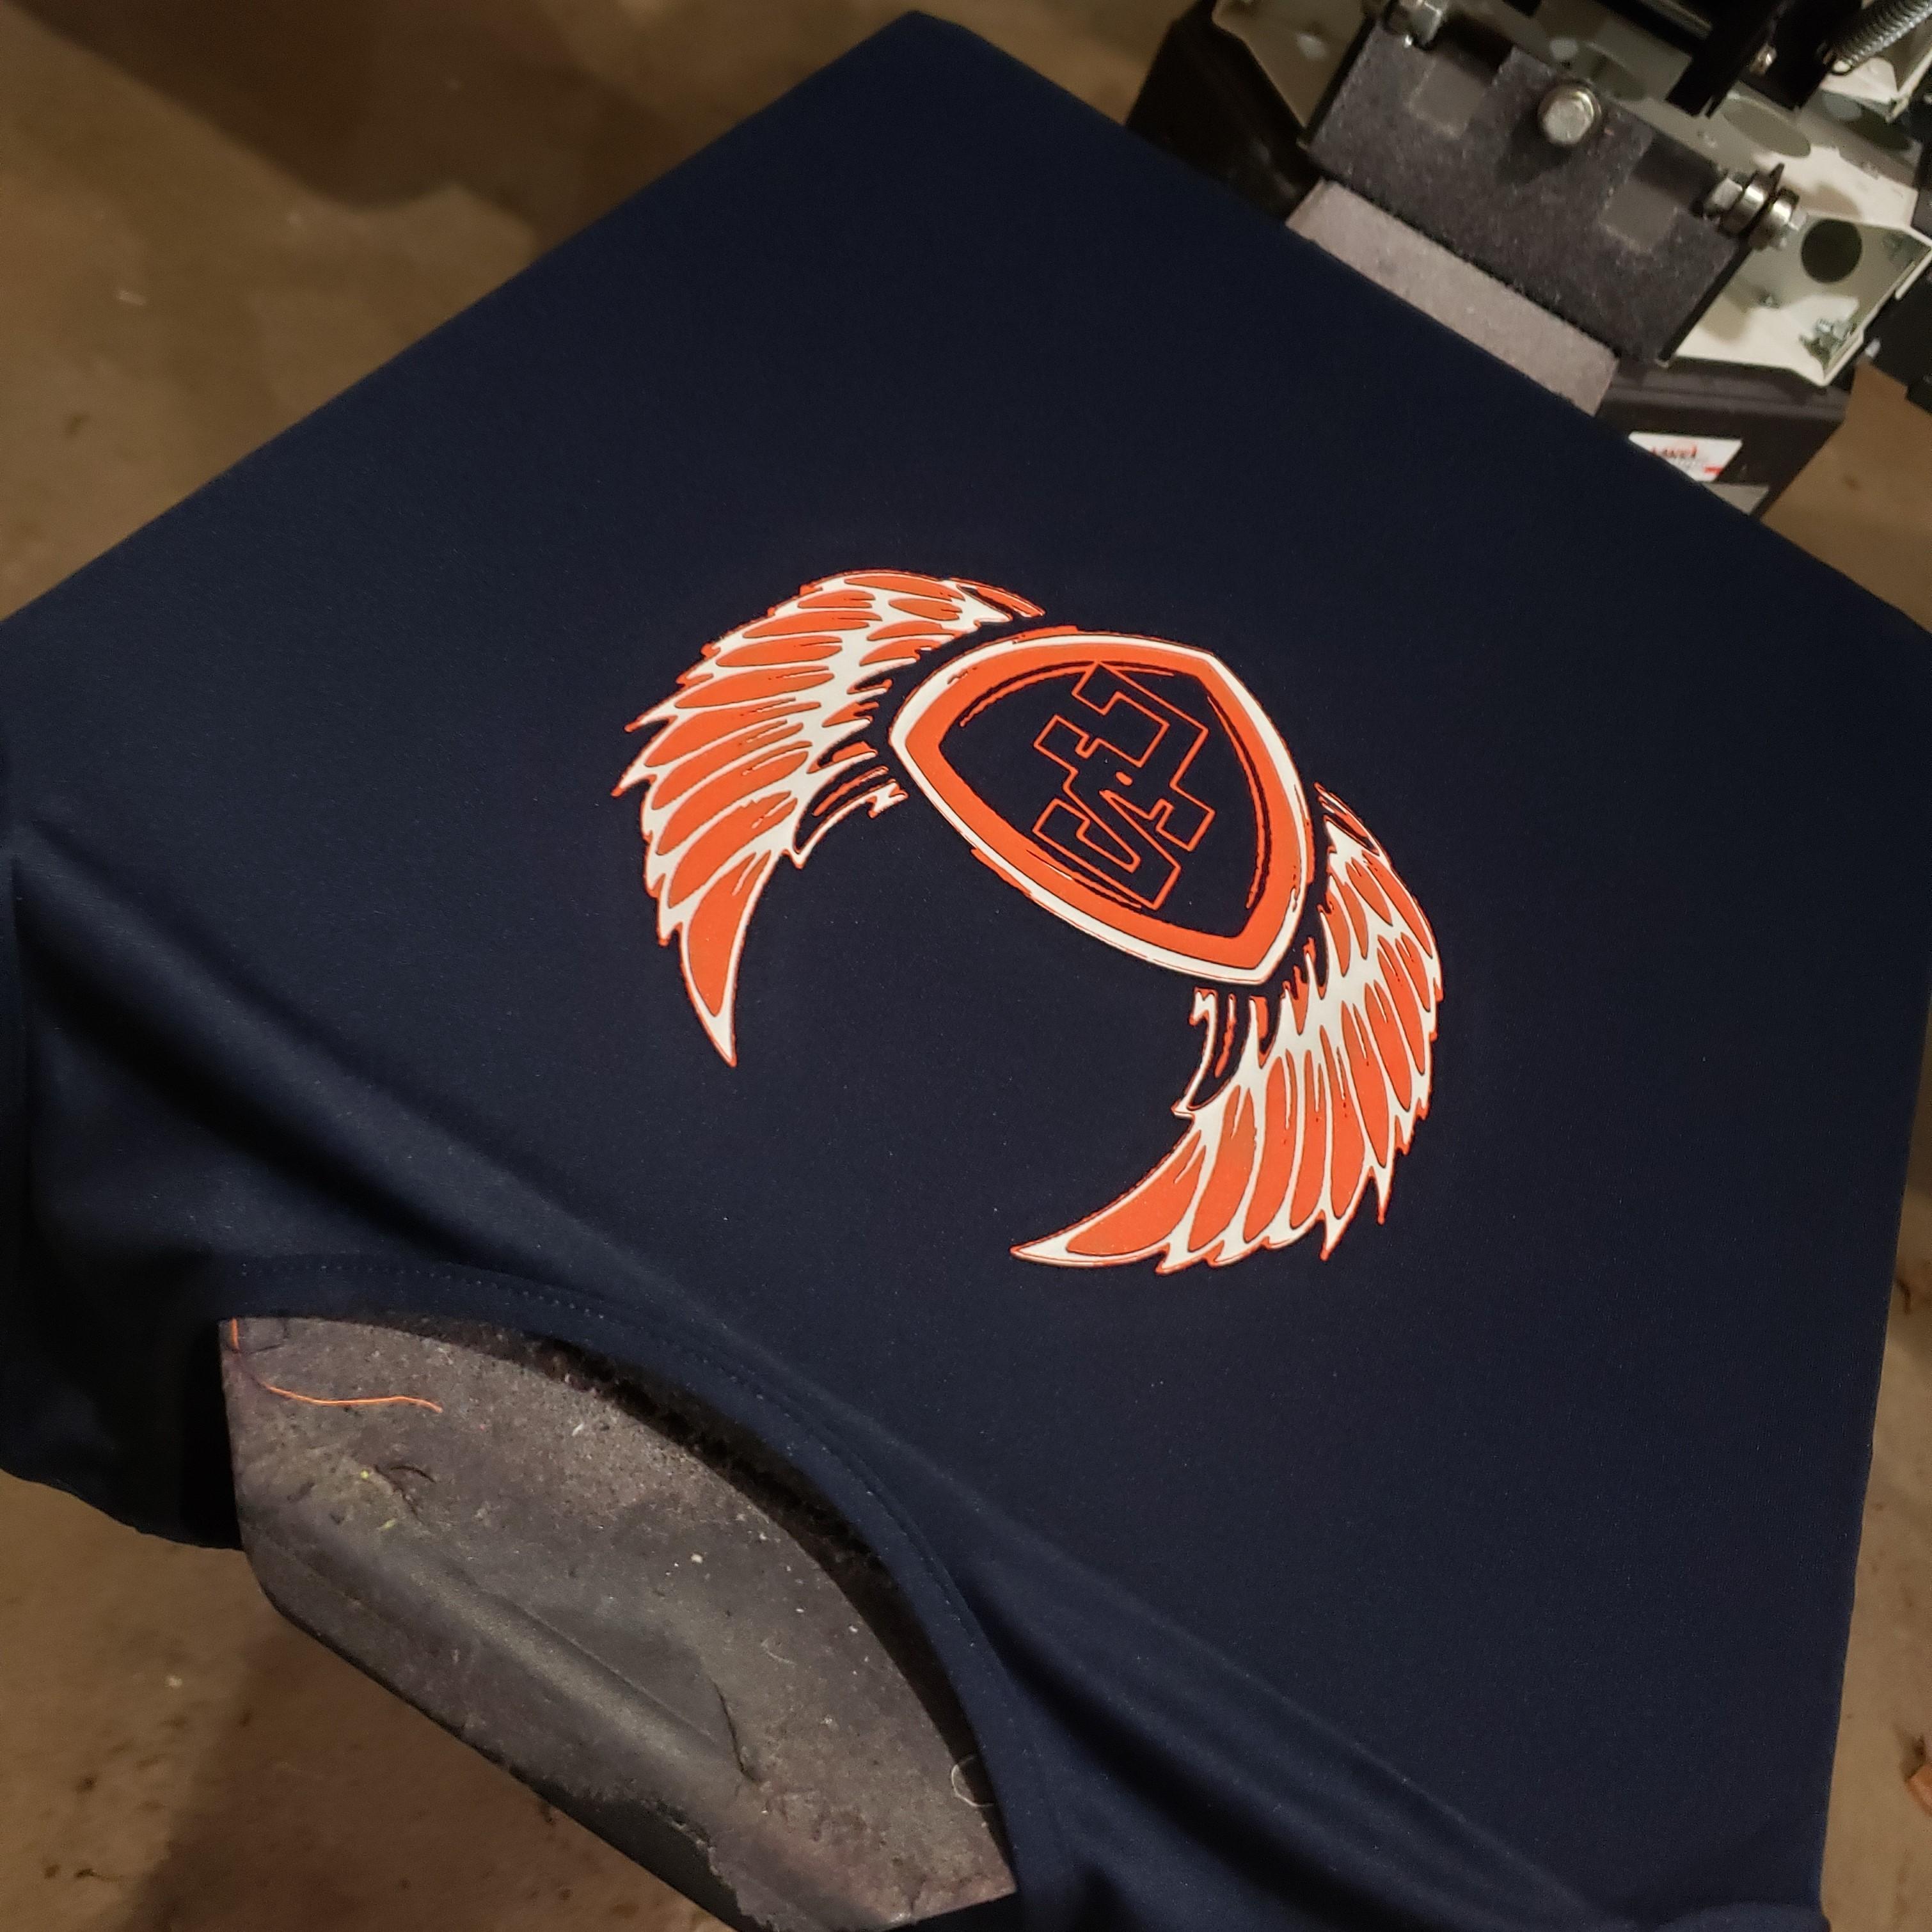 T-Shirt on screen printing machine